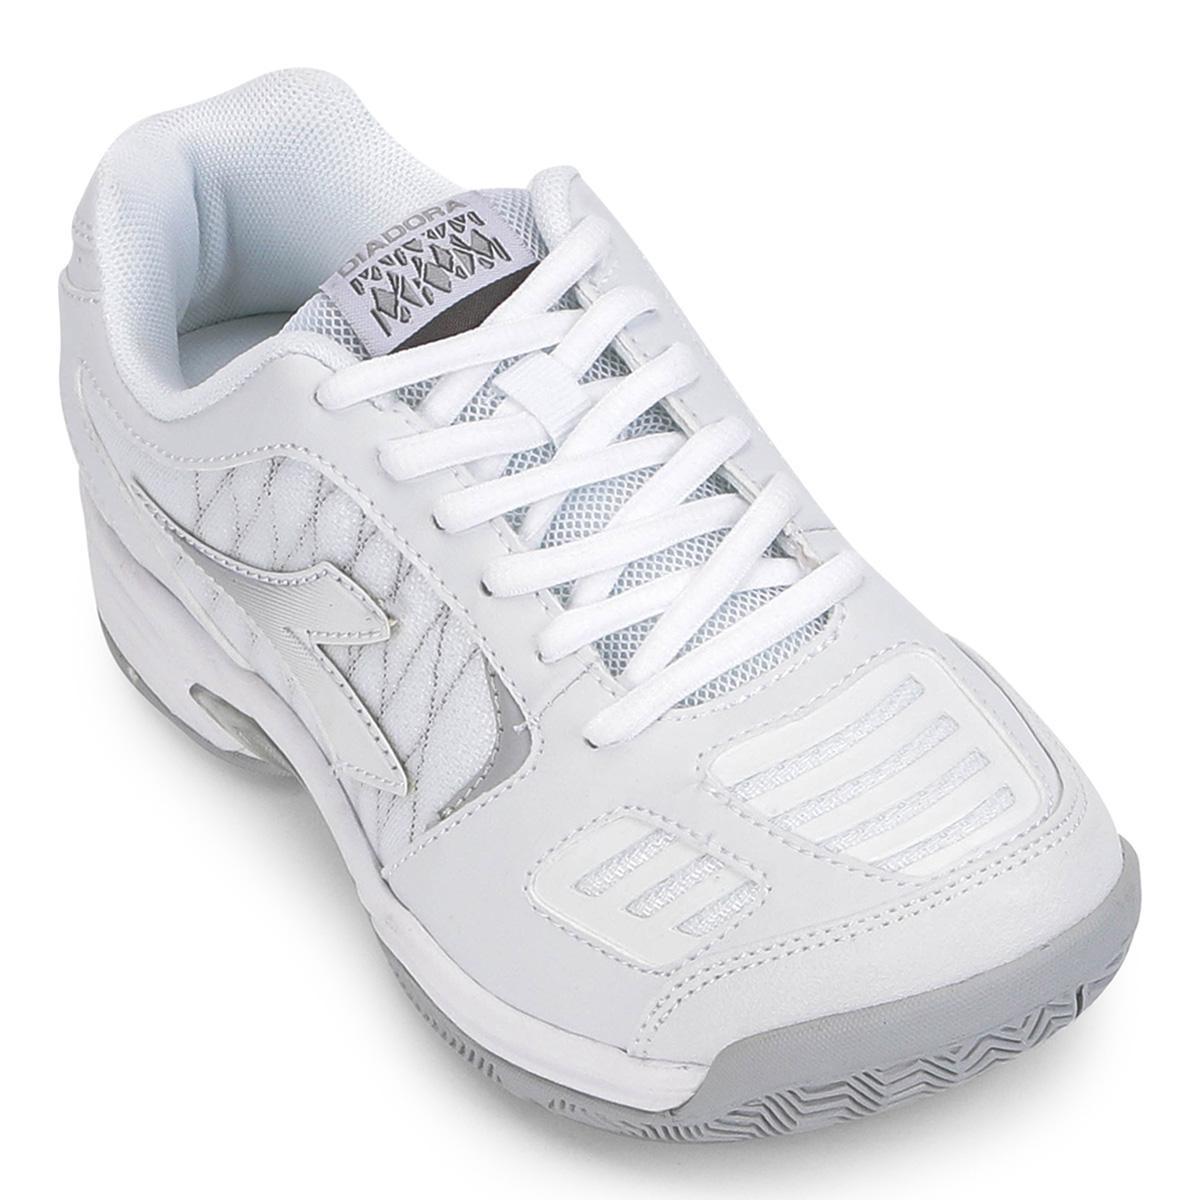 bd23d90b5fe tênis diadora hi supreme 3 feminino - cor branco+prata. Carregando zoom.